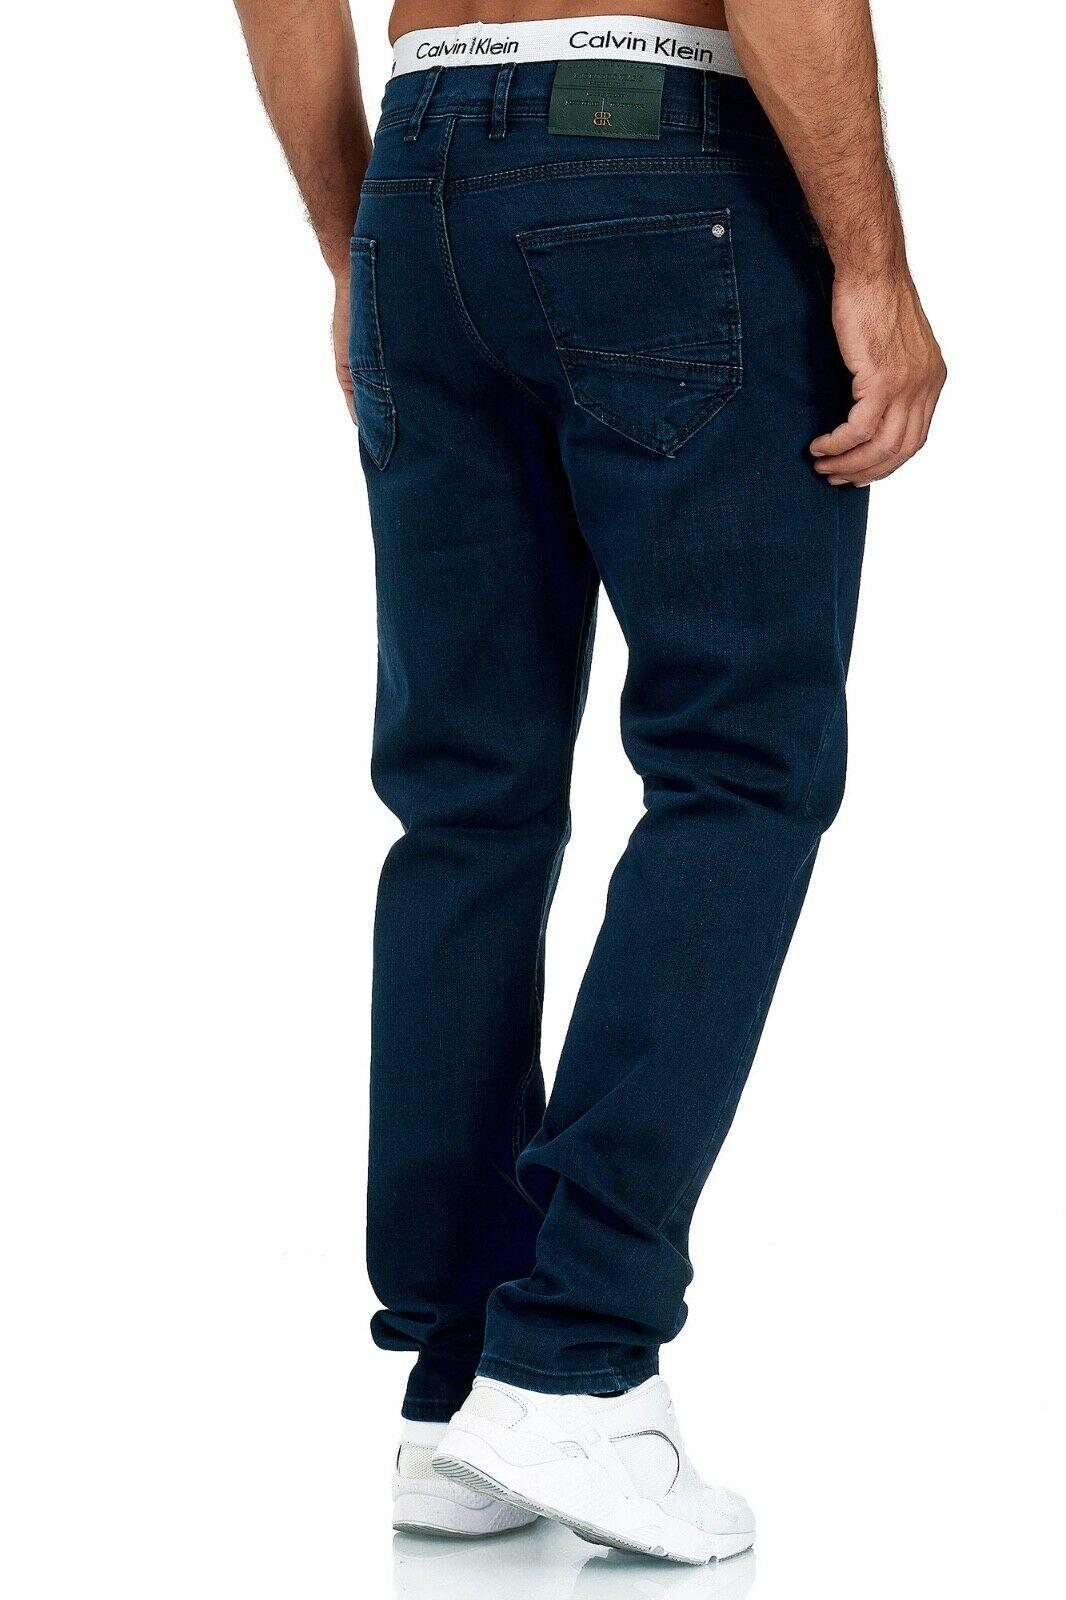 Herren-Jeans-Hose-Denim-KC-Black-Washed-Straight-Cut-Regular-Dicke-Naht-naehte Indexbild 44